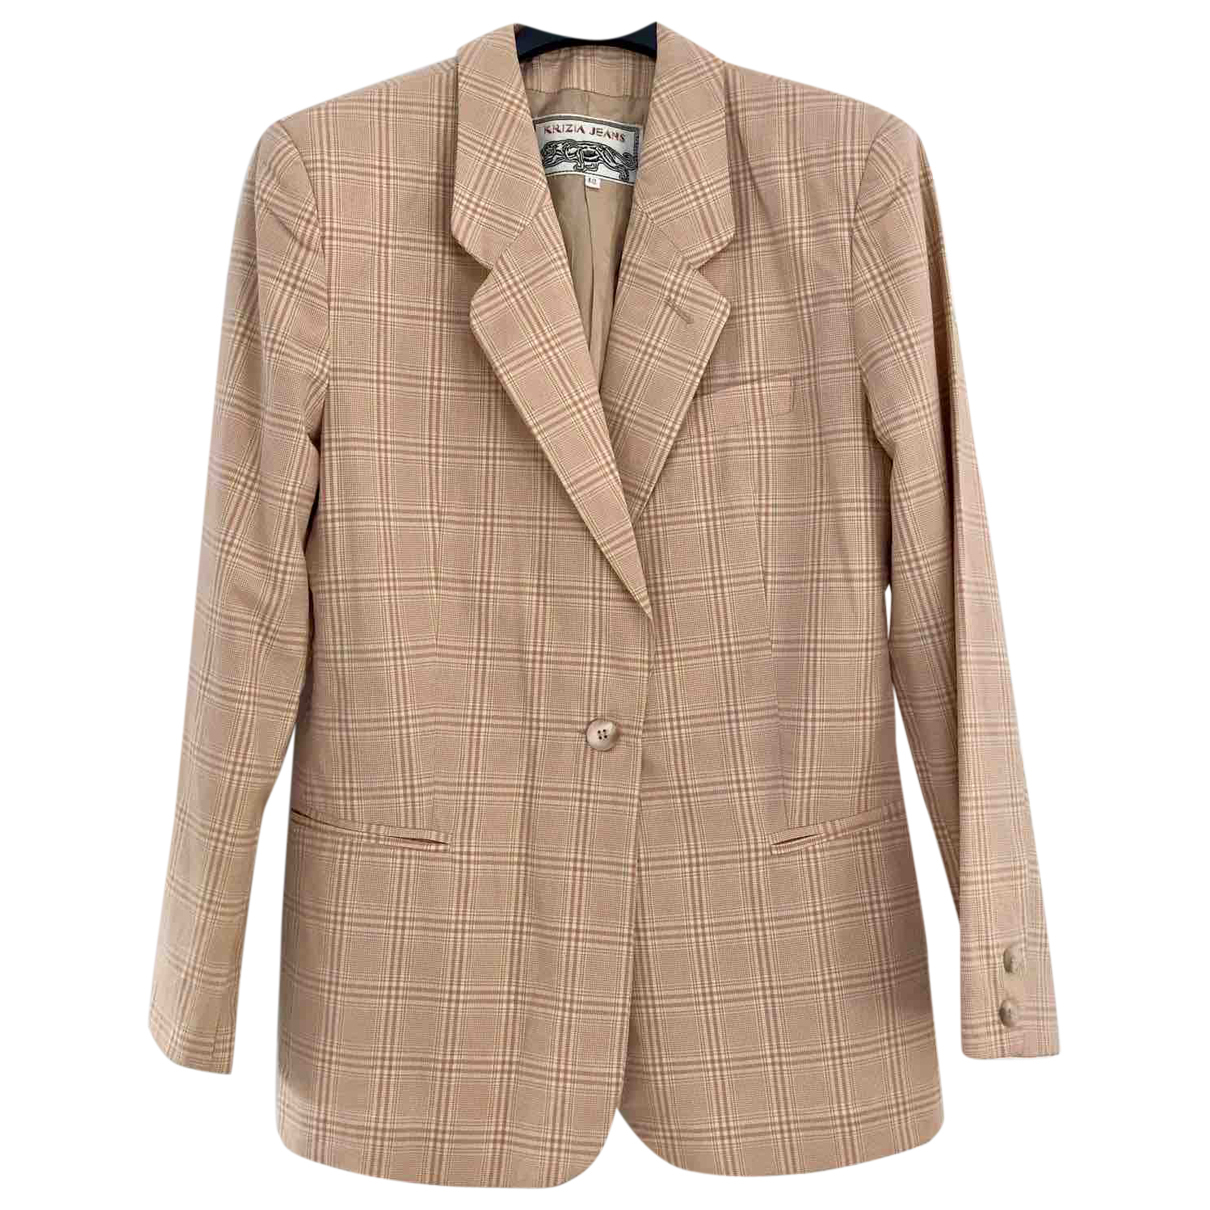 Krizia \N Pink Cotton jacket for Women 42 IT